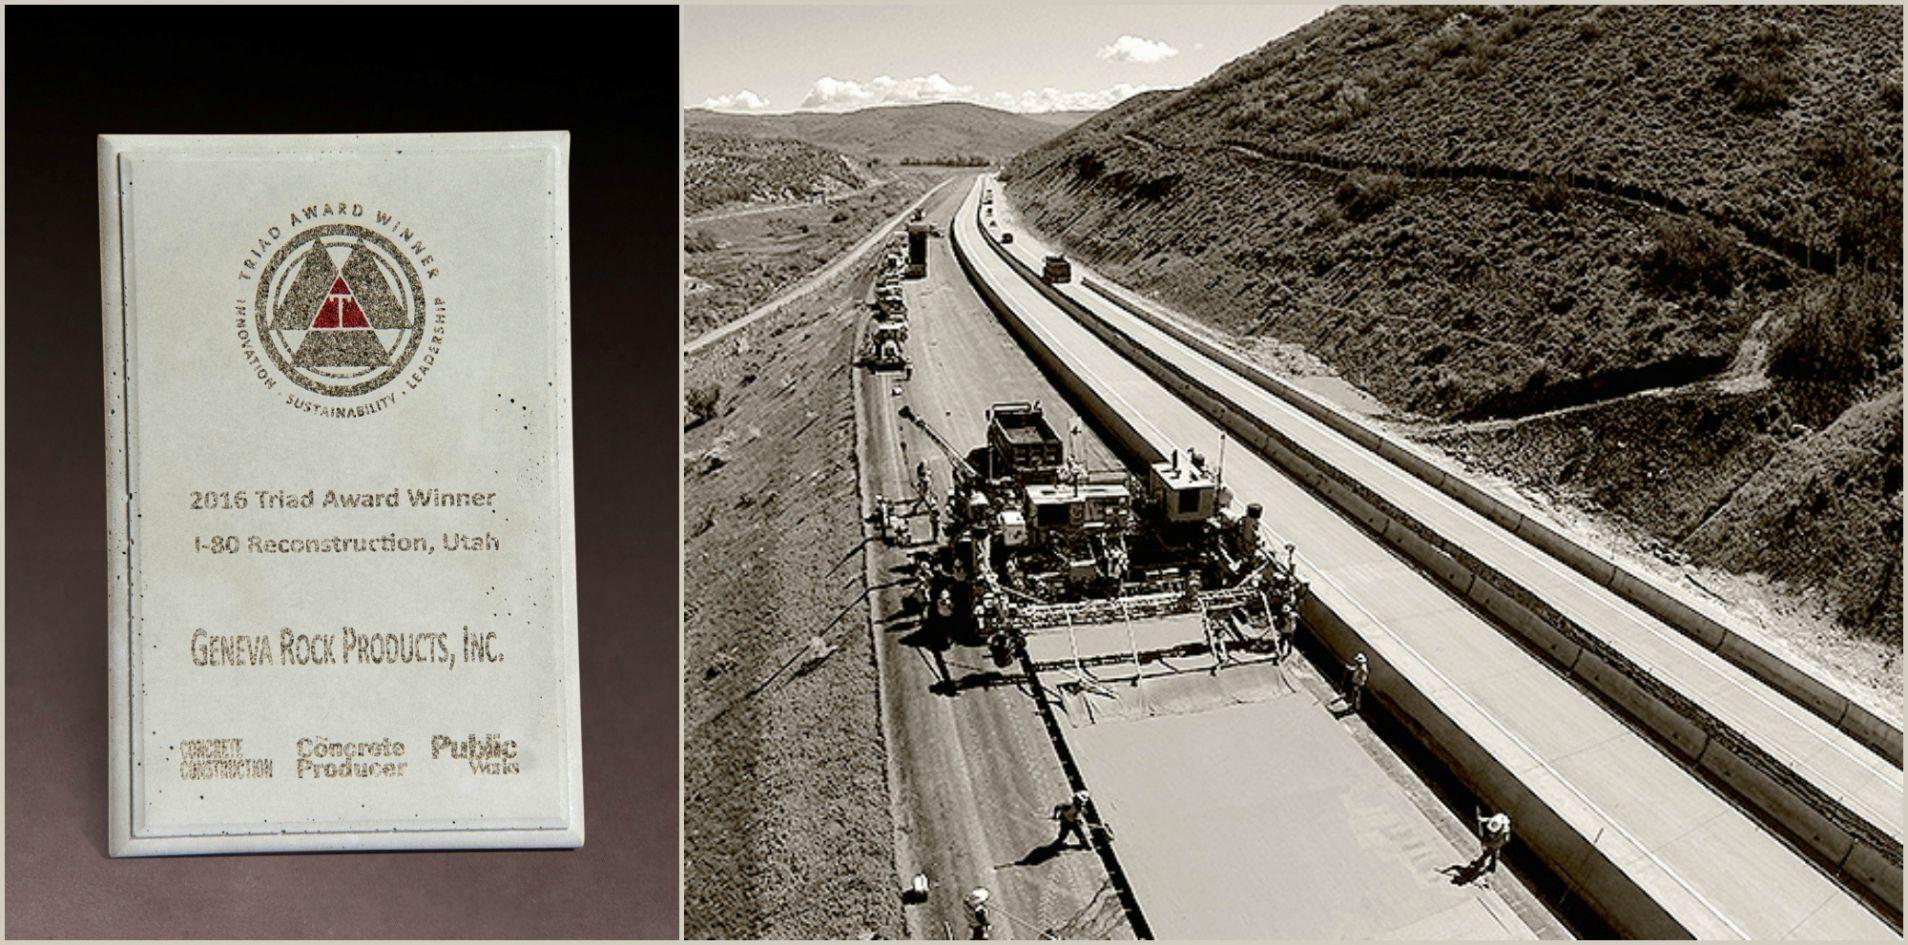 Geneva Rock Receives Triad Award for I-80 Reconstruction Project